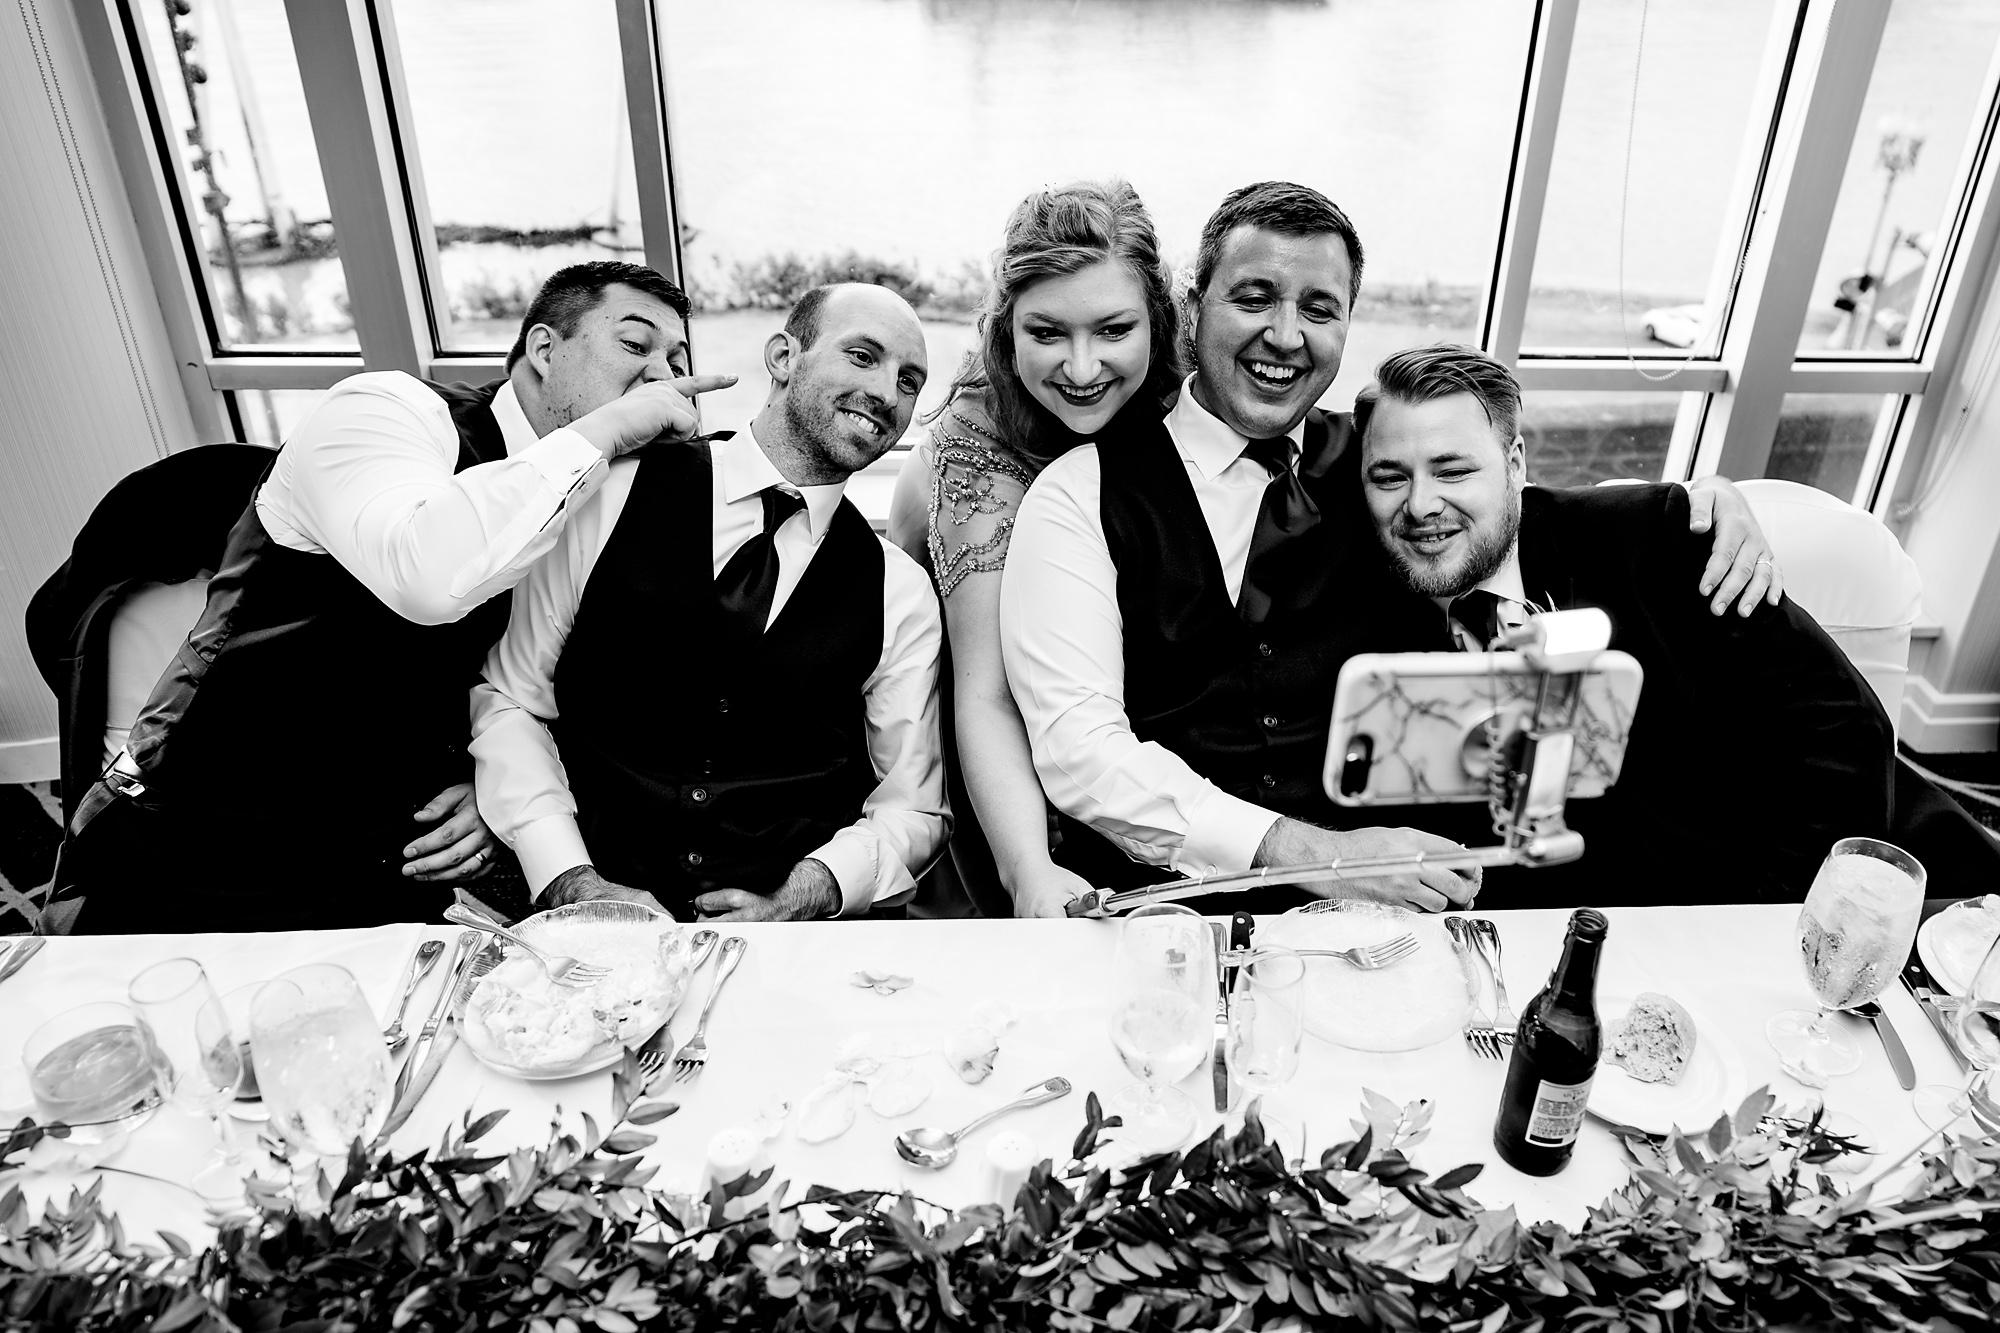 Embassy-Suites-Rivercenter-Wedding-Photography-29.jpg